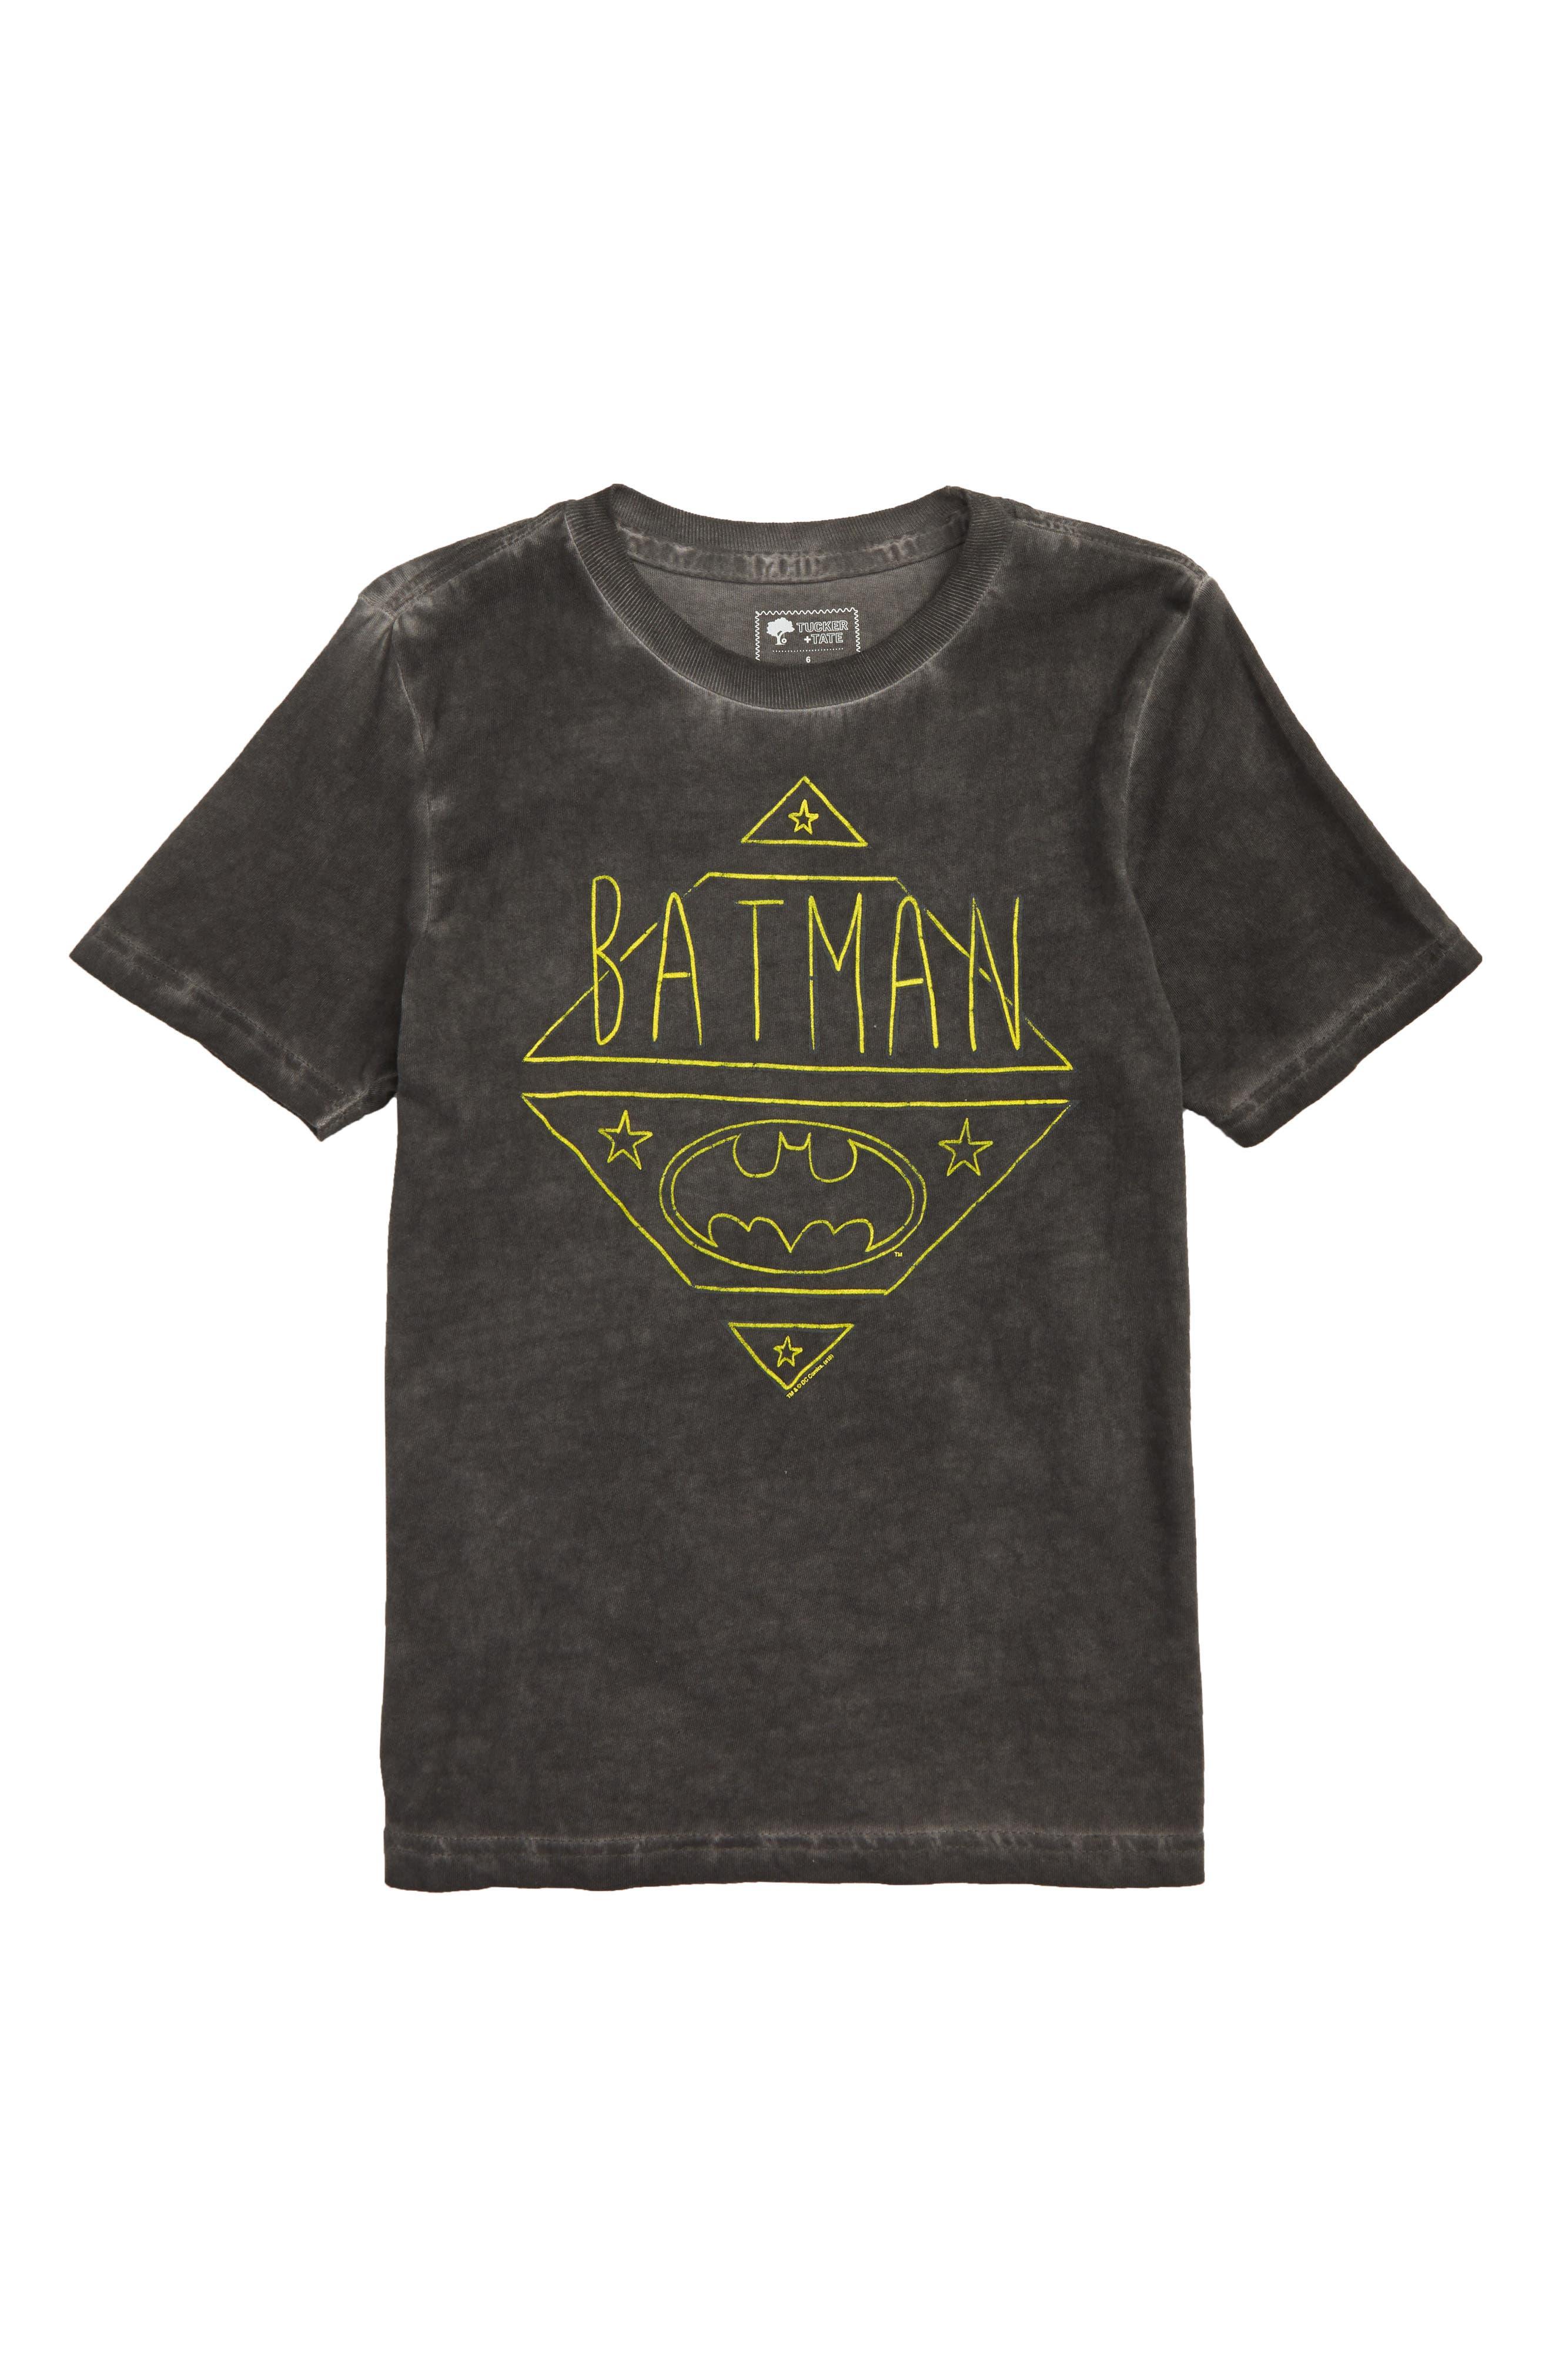 DC Comics Washed Graphic T-Shirt,                             Main thumbnail 1, color,                             NAVY CAPTAIN BATMAN